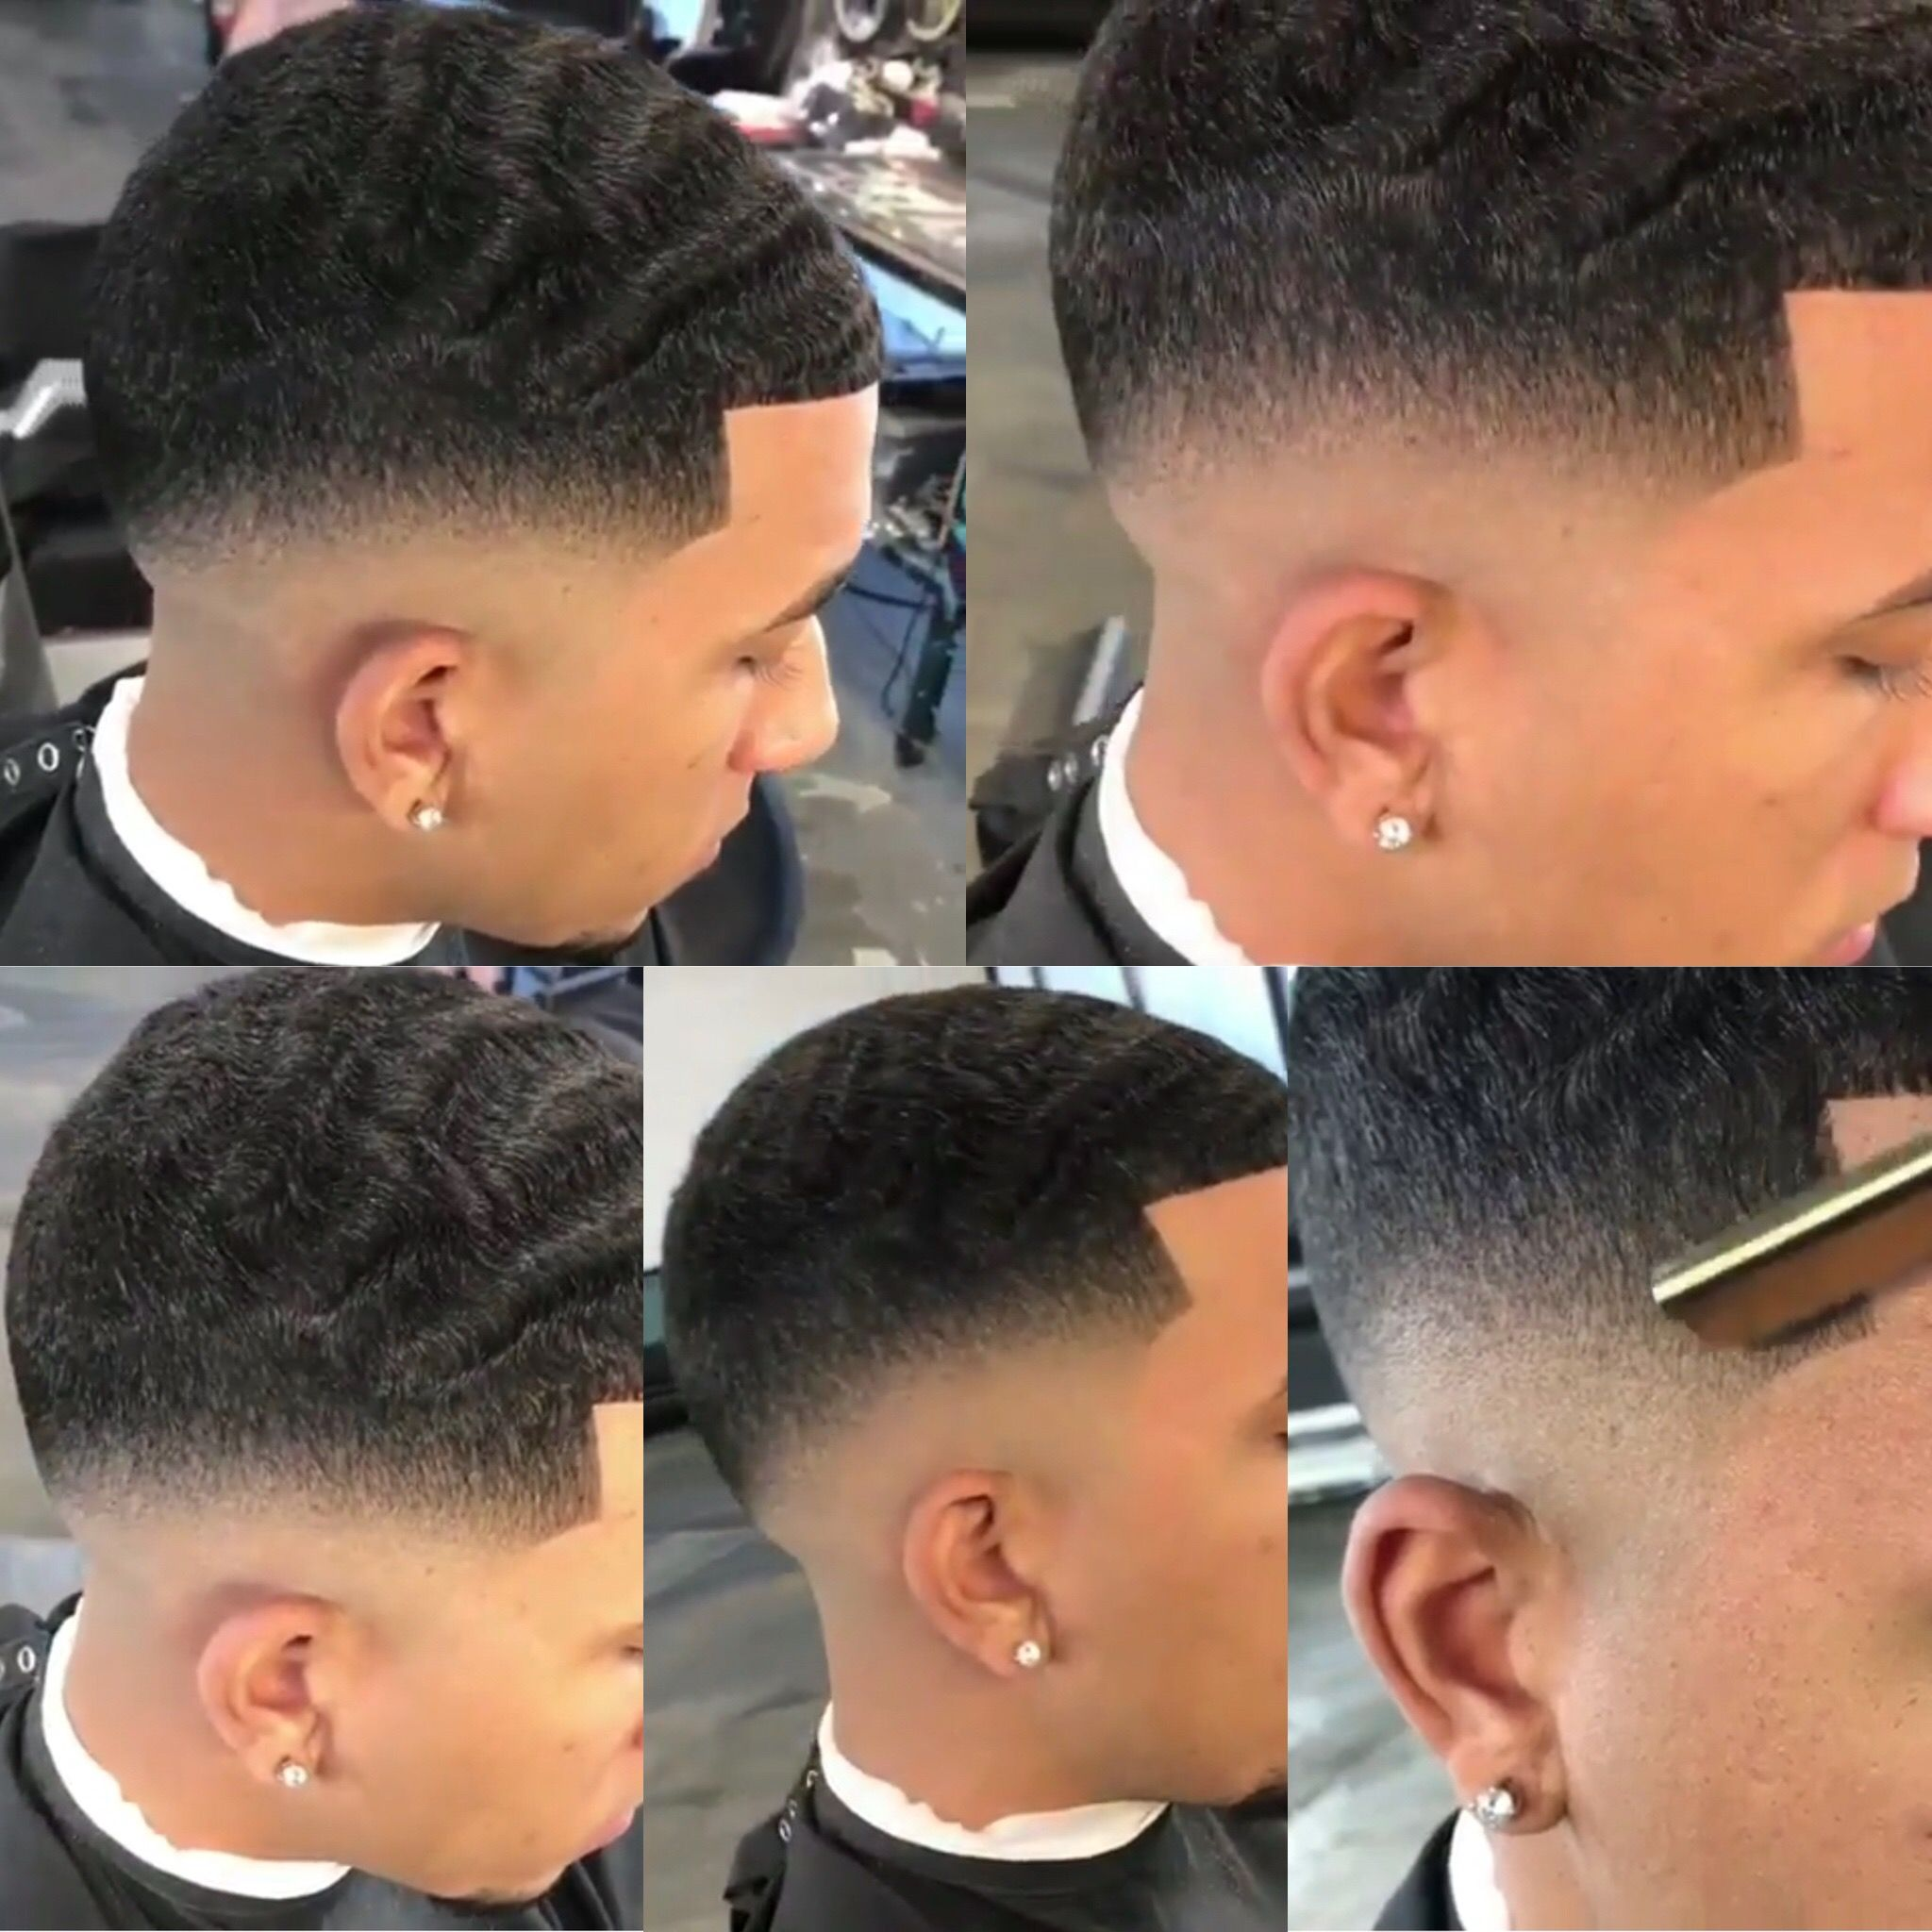 Pin By Brian Lawson On Hair Waves Haircut Hair And Beard Styles Hair Waves